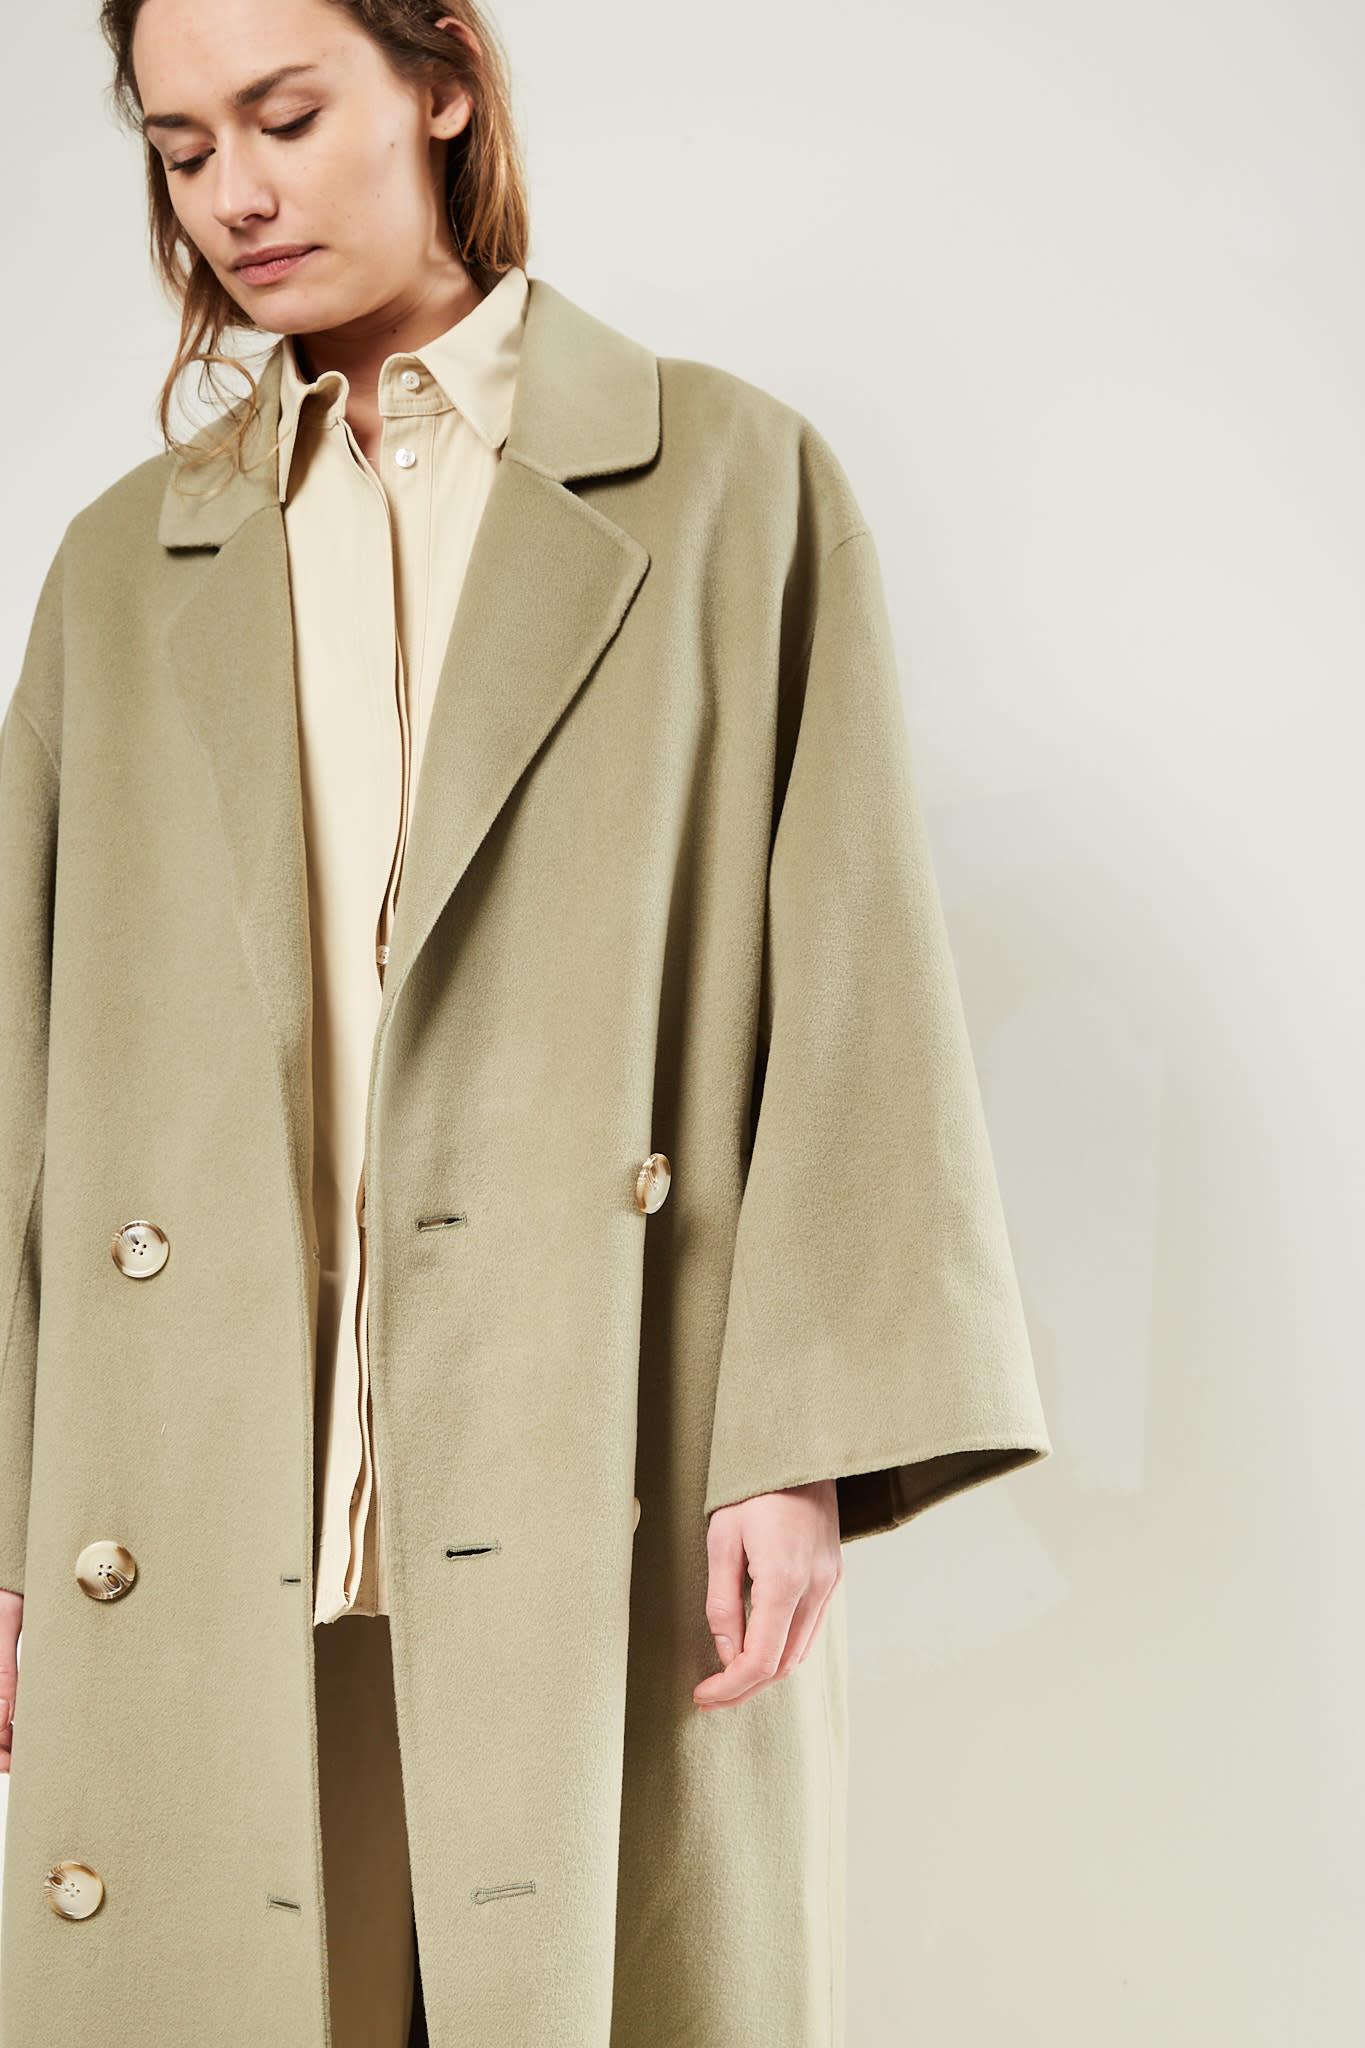 loulou studio Borneo wool cashmere coat